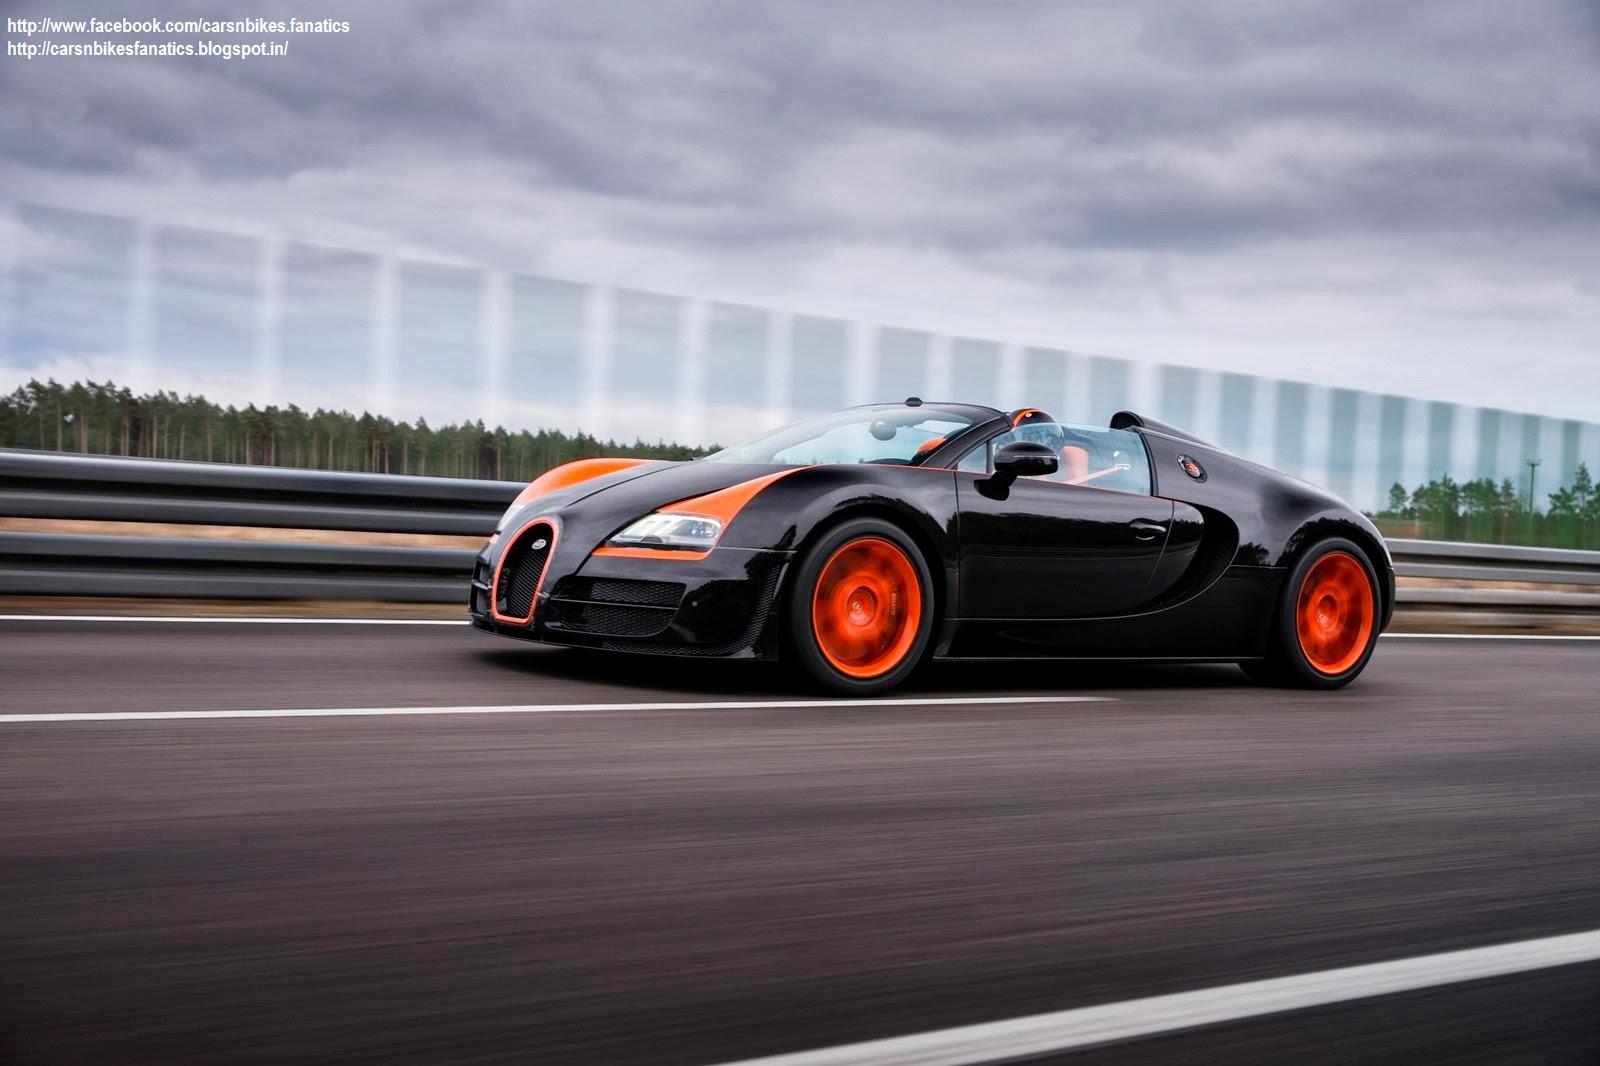 Car & Bike Fanatics: Bugatti Veyron Grand Sport Vitesse